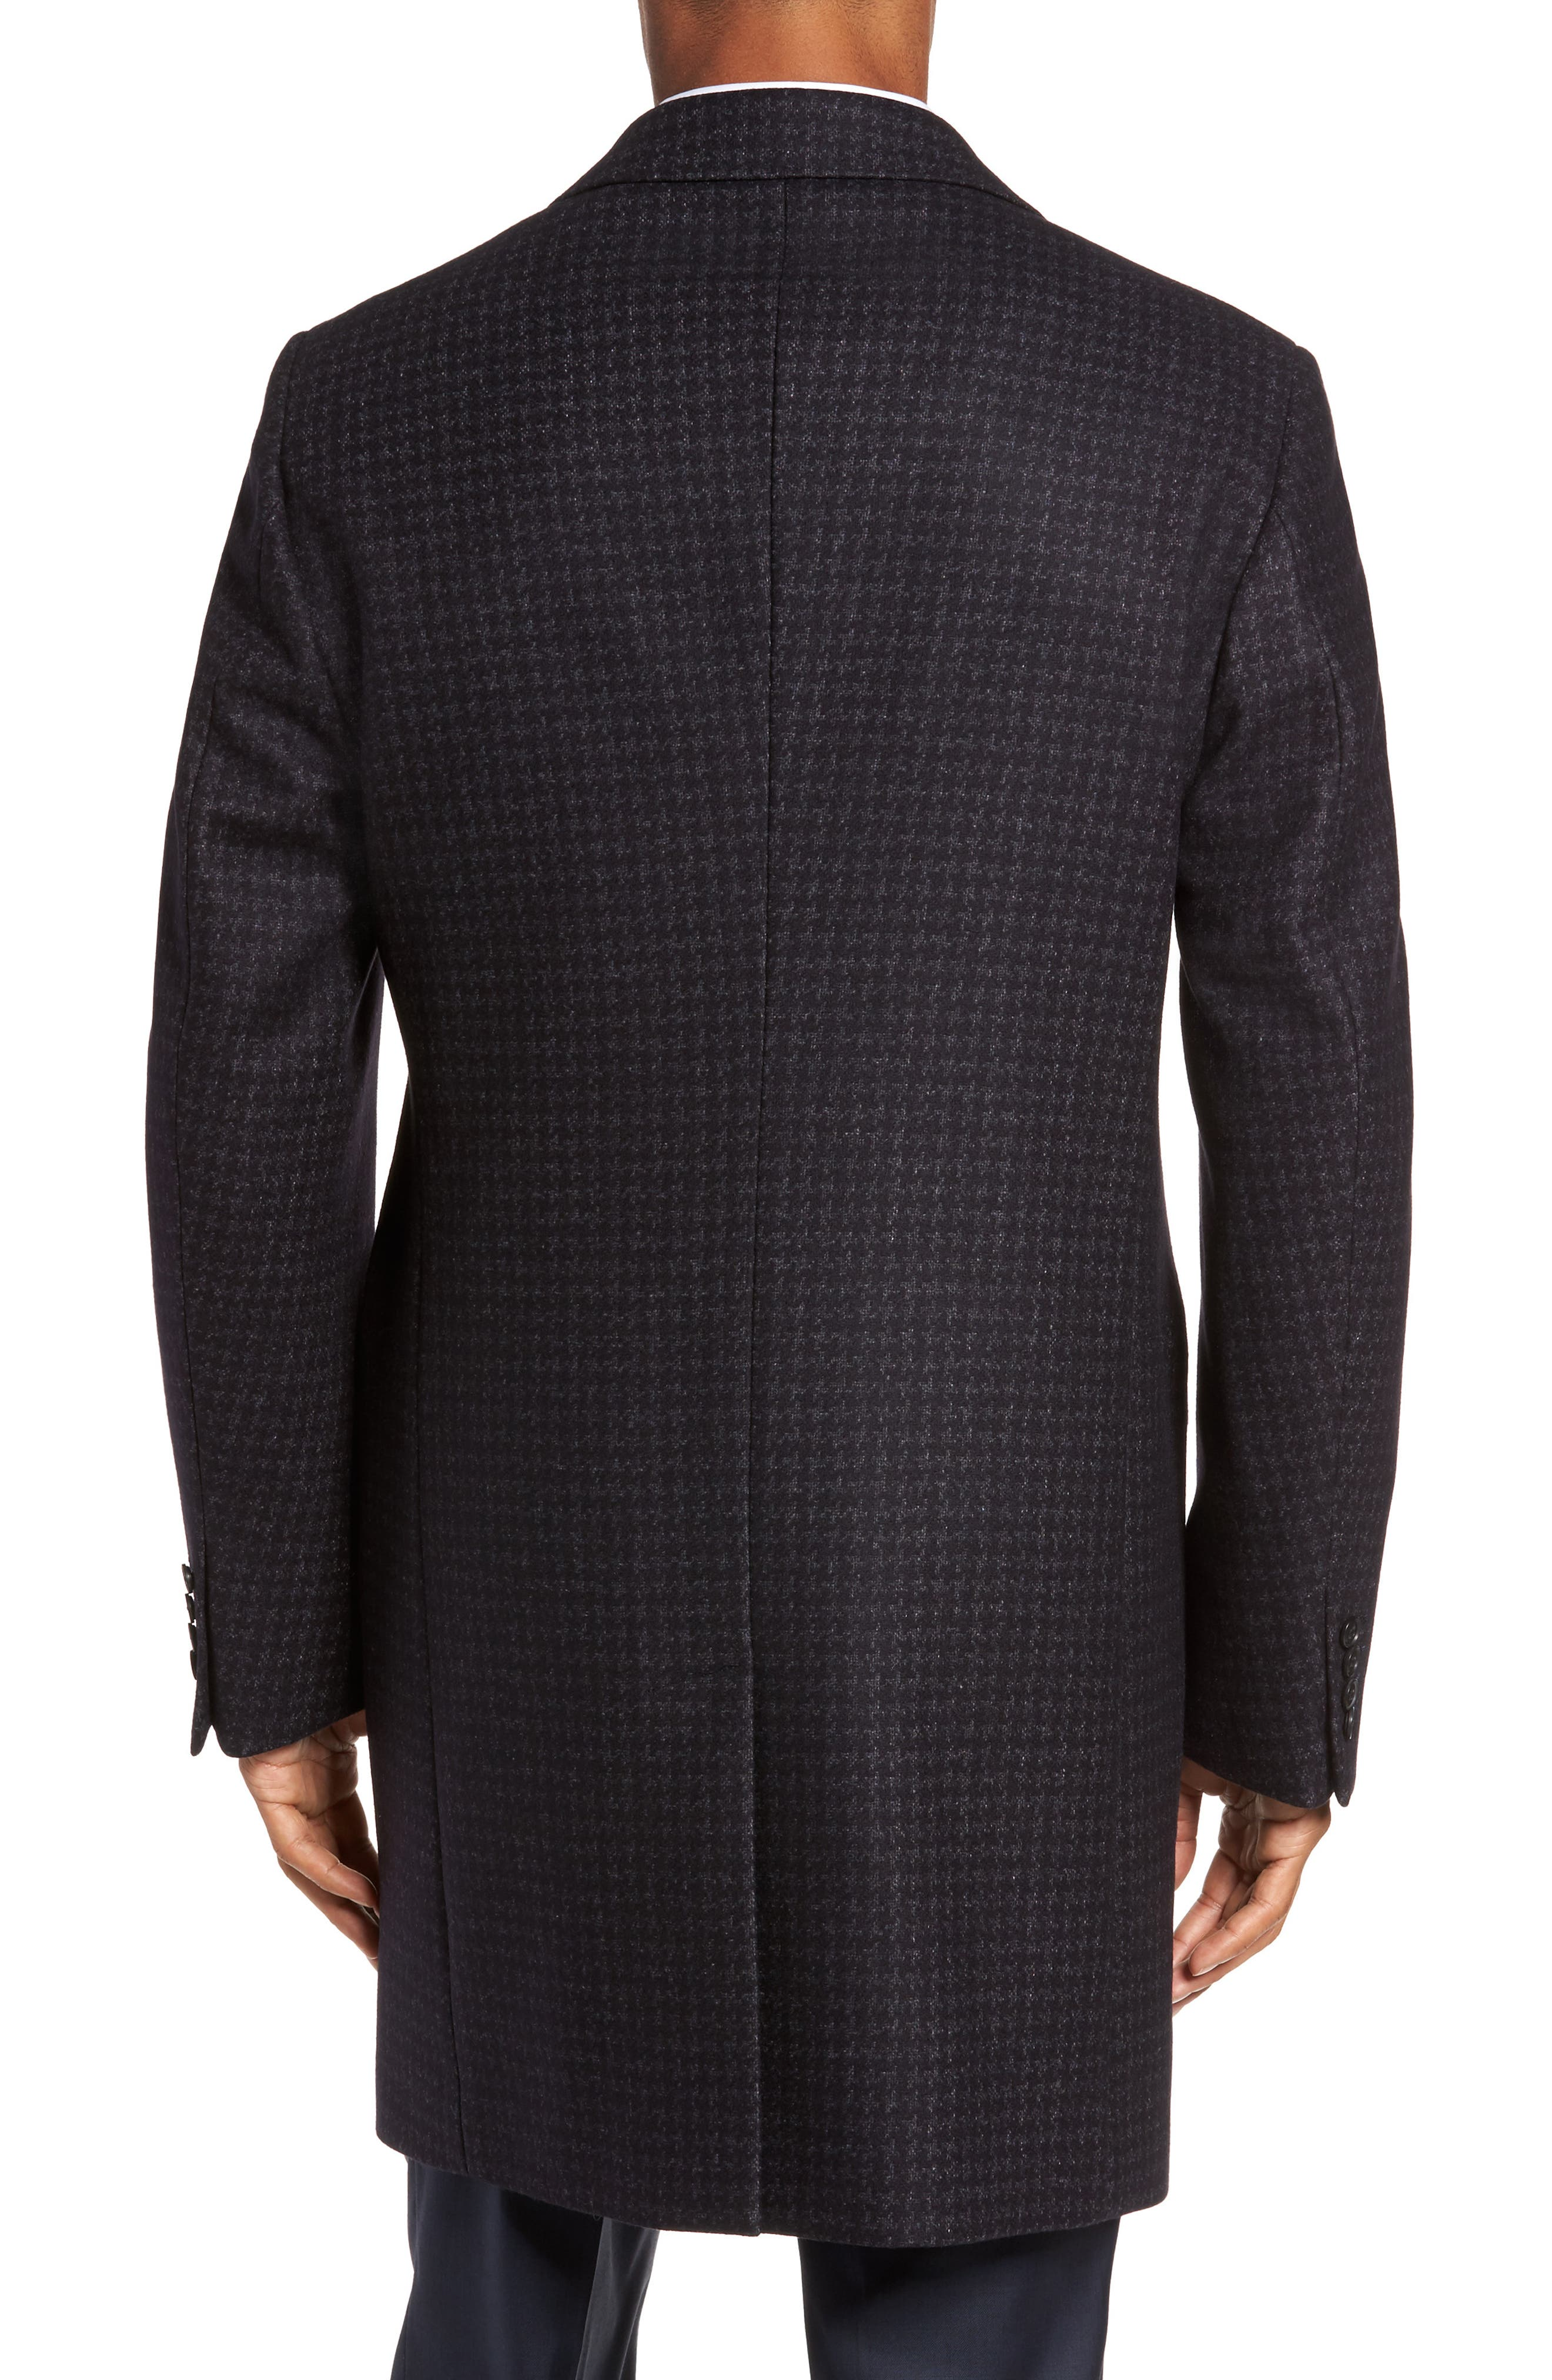 Jackson Houndstooth Wool Blend Overcoat,                             Alternate thumbnail 2, color,                             410